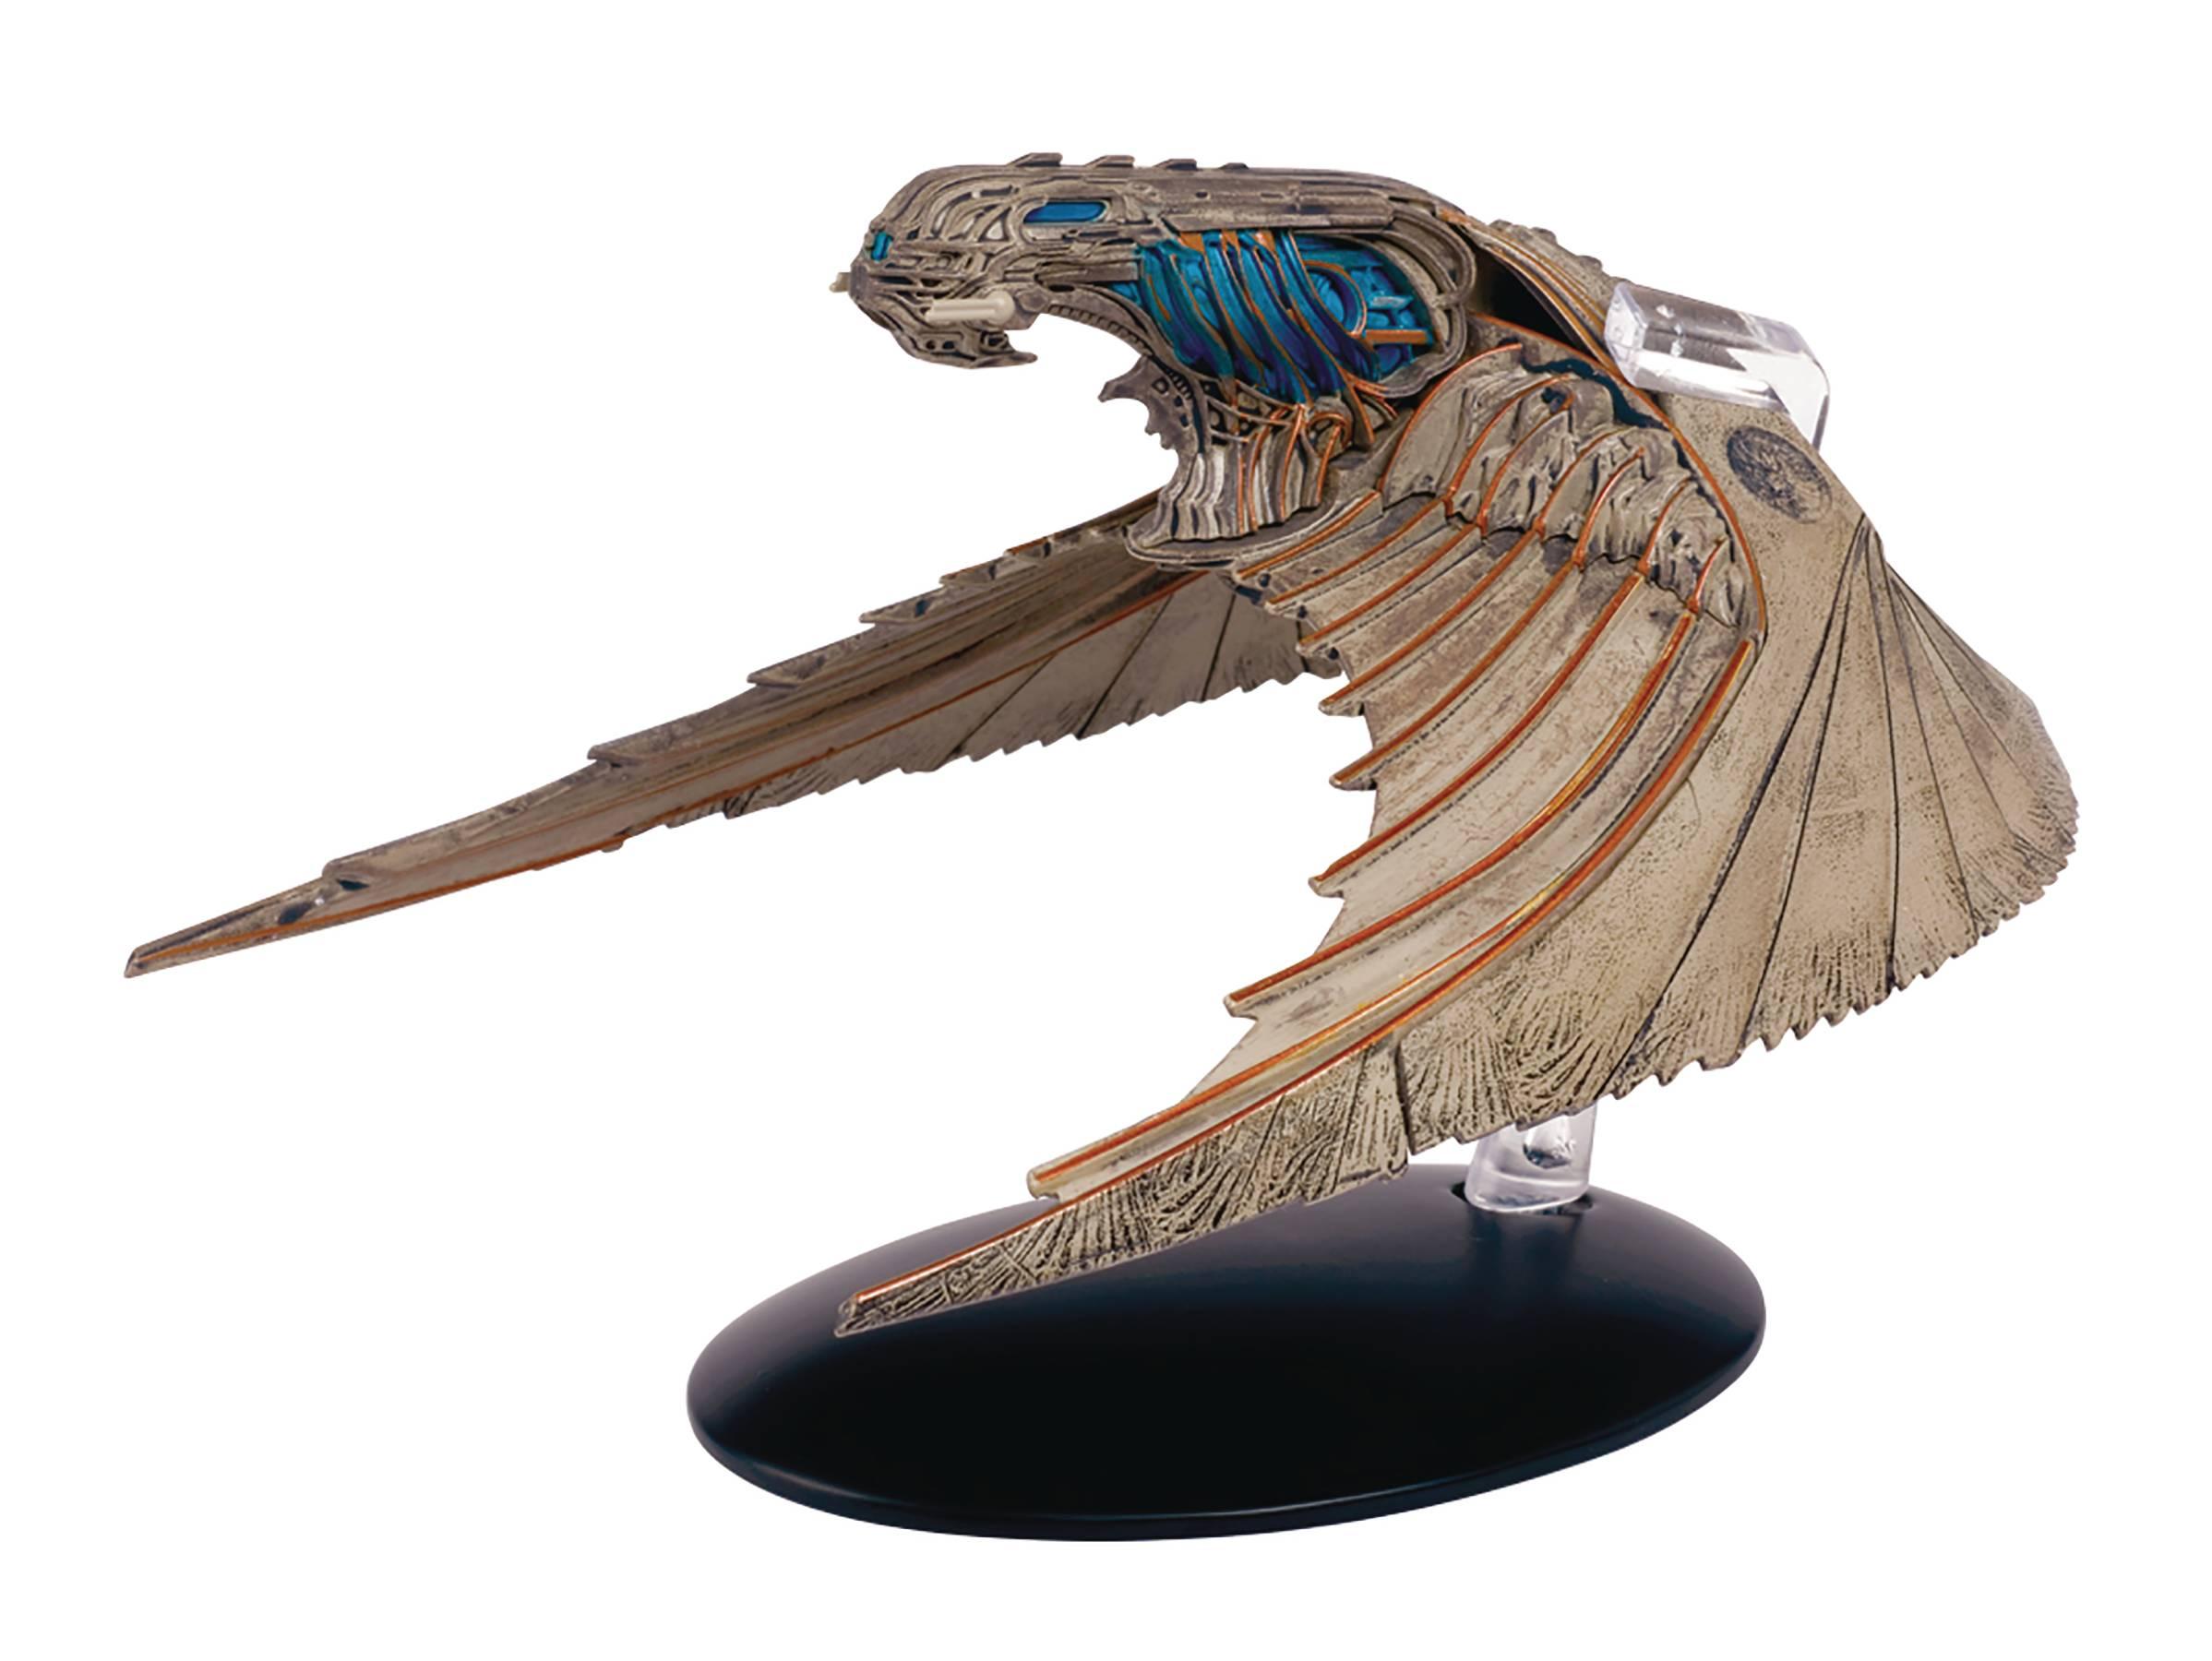 Klingon Bird-of-Prey Starship Model with Magazine #4 by E Discovery Star Trek